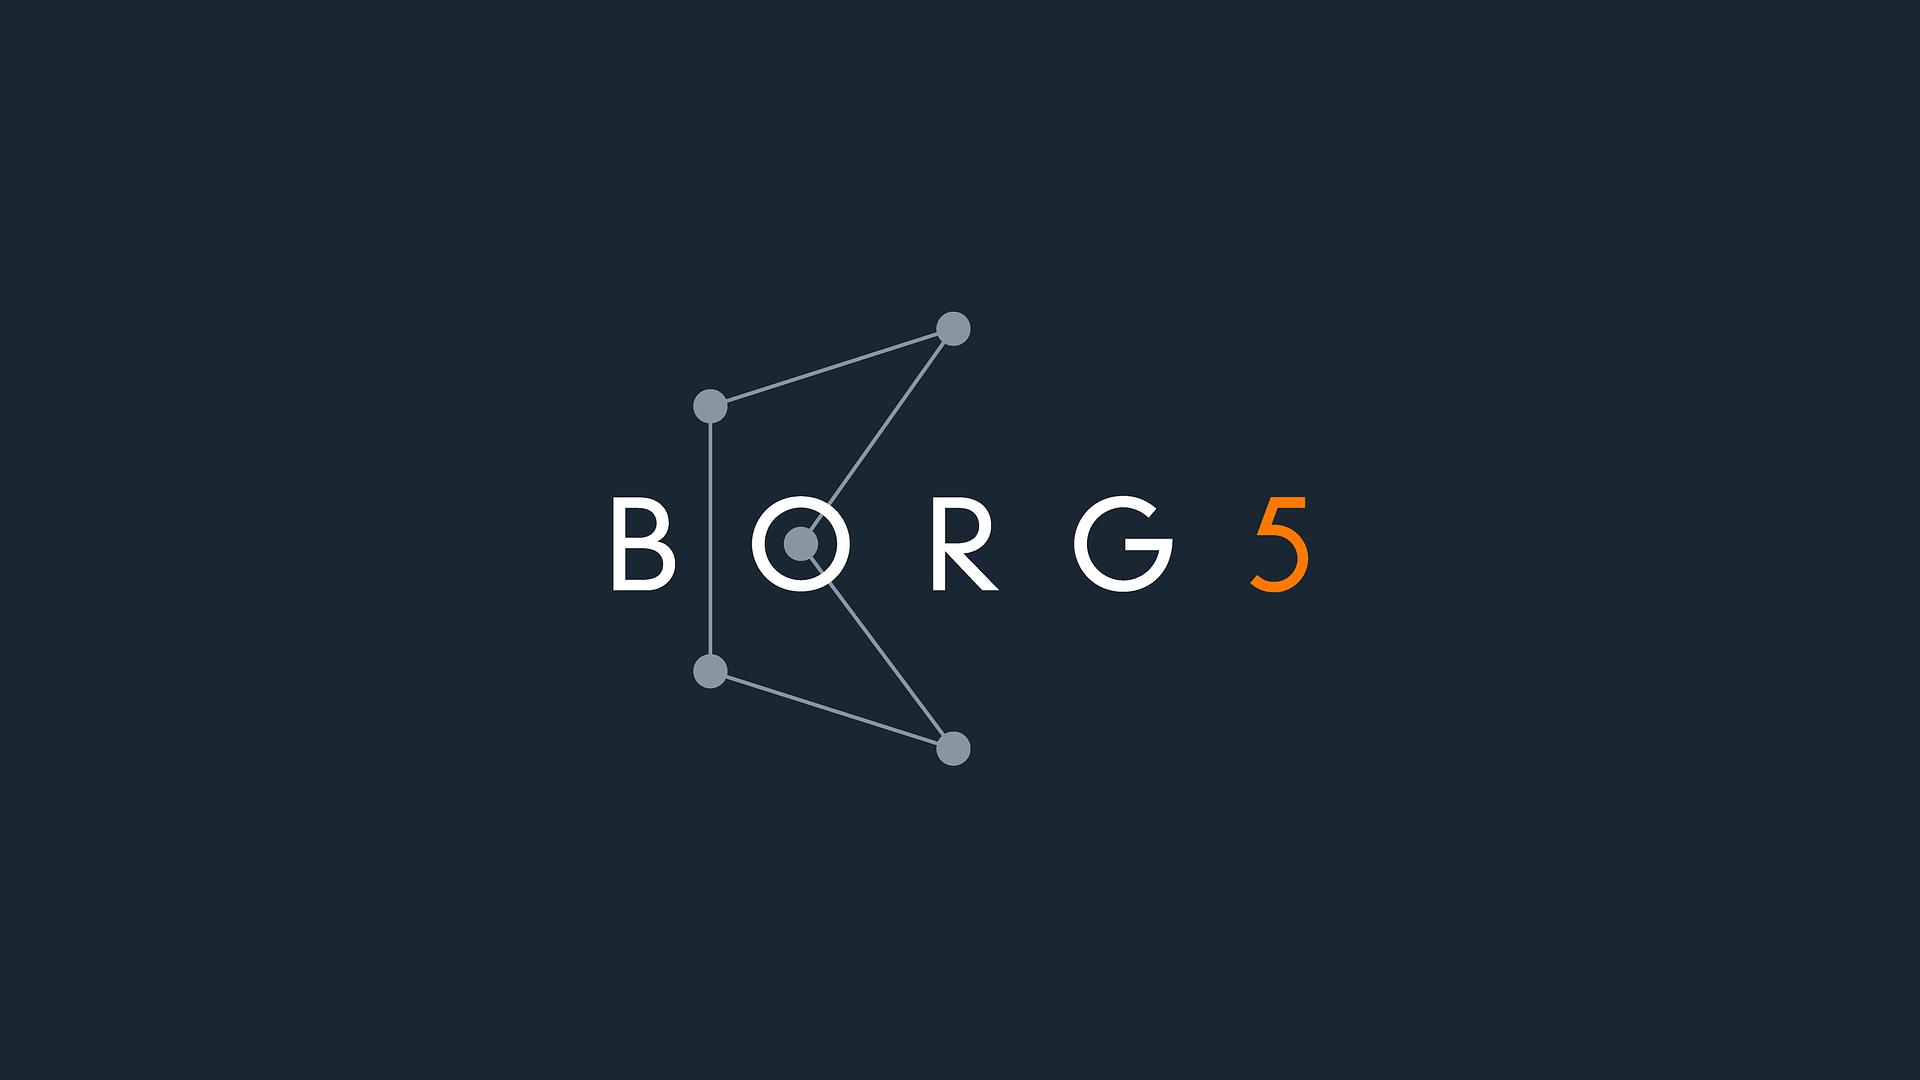 Borg5 logo